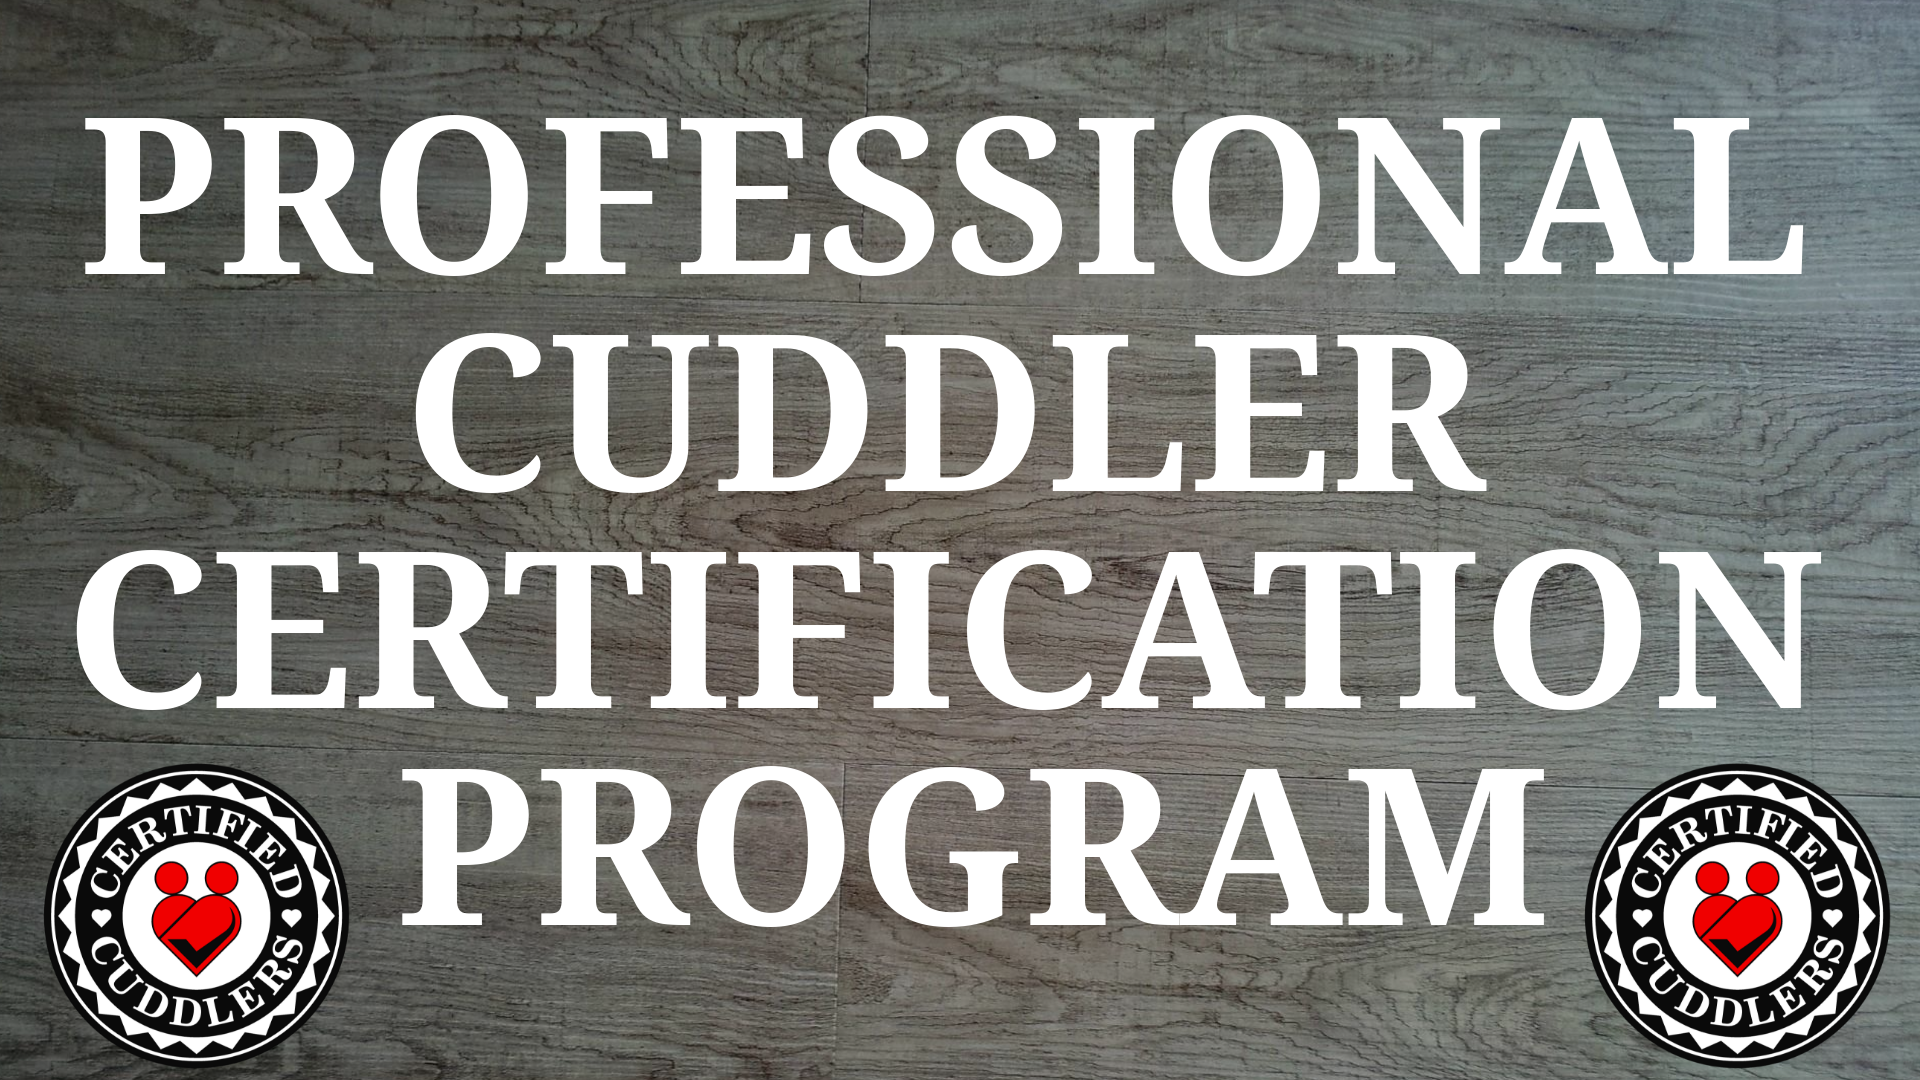 Professional Cuddler Certification Program Beta